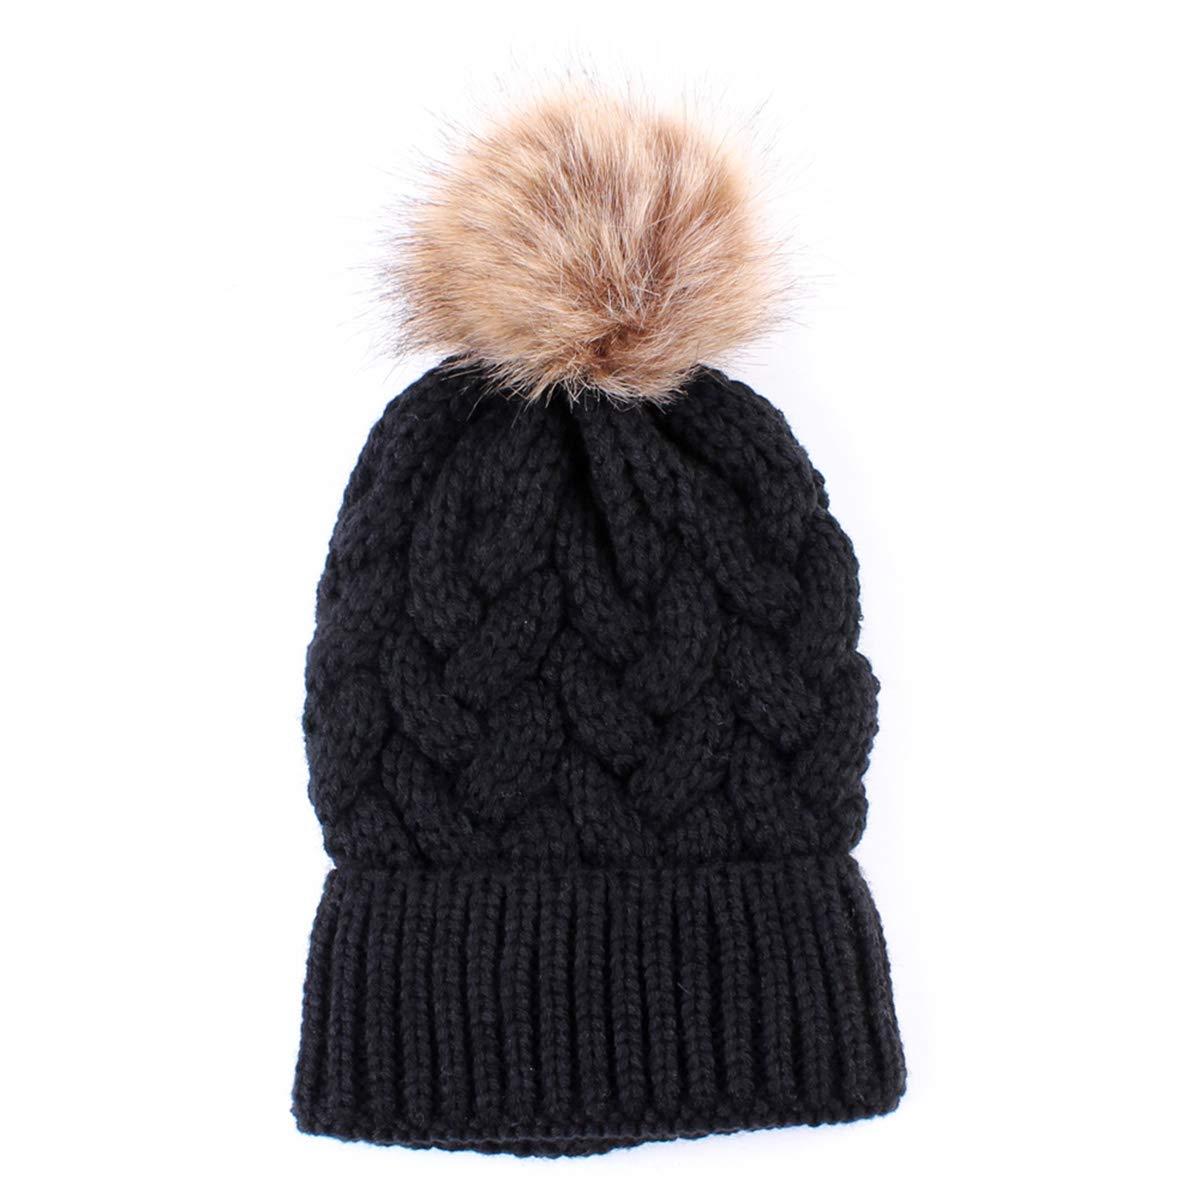 e9b333183c0d0 2PCS Mother Baby Hat Family Matching Cap Winter Warmer Knit Wool Beanie Ski  Cap (Black)  Amazon.co.uk  Clothing